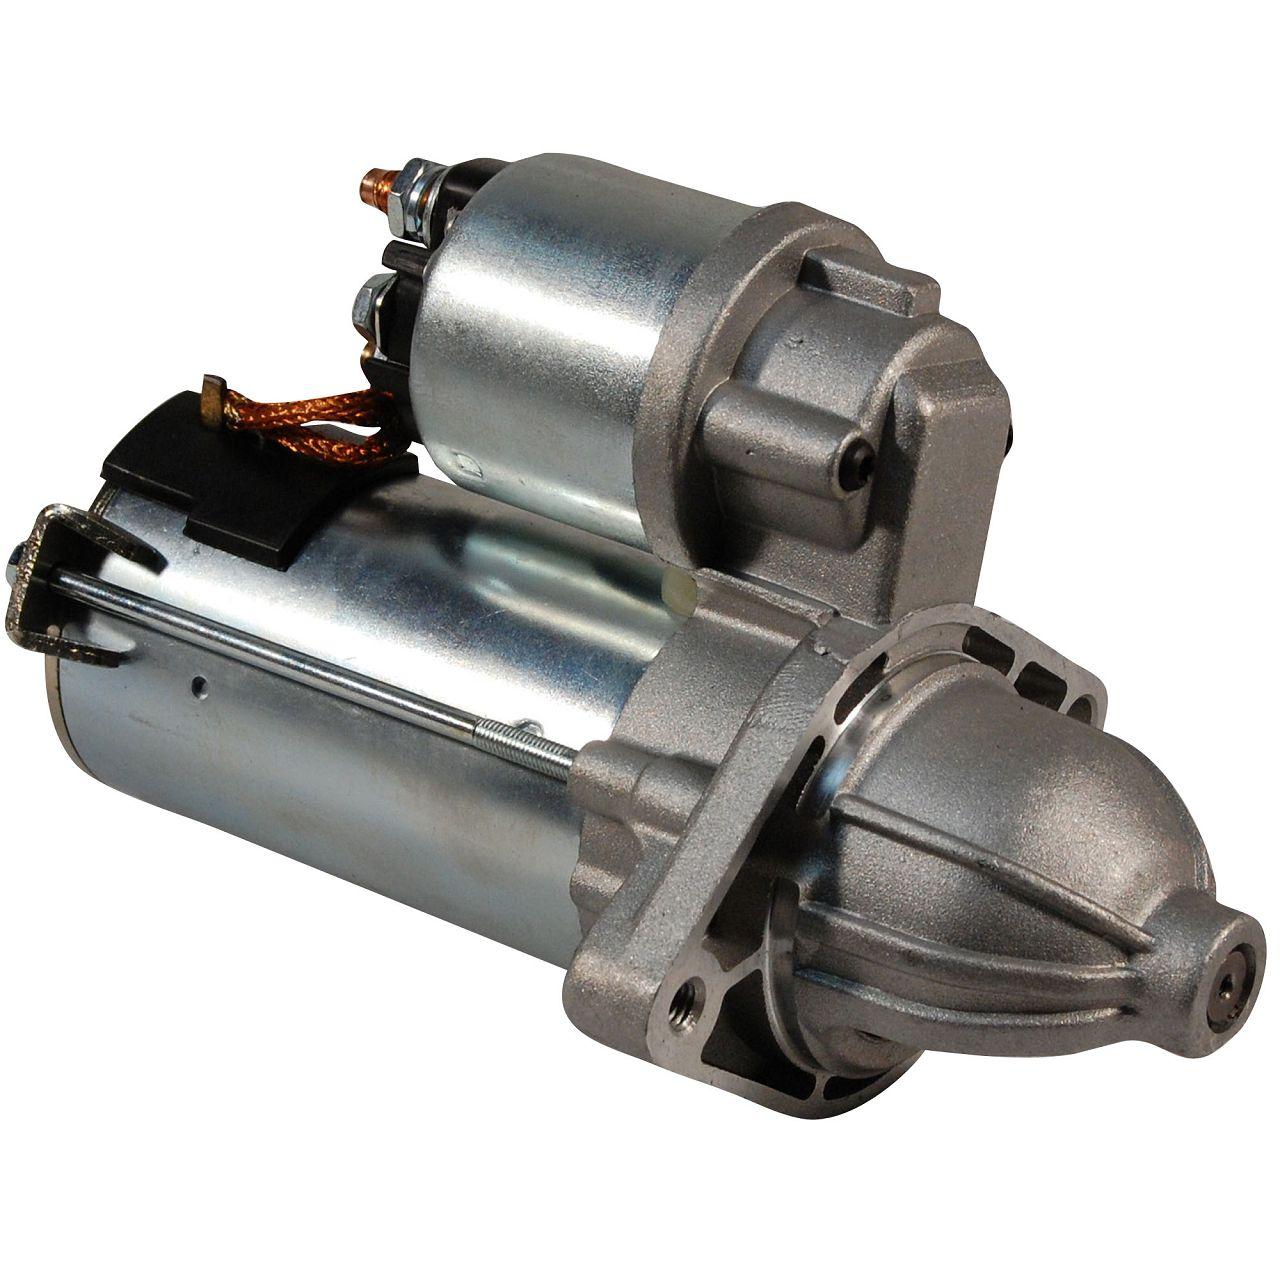 Anlasser Starter 12V 1,1 kW OPEL Agila Astra H Combo Corsa C D Meriva Tigra B 1.3 CDTI